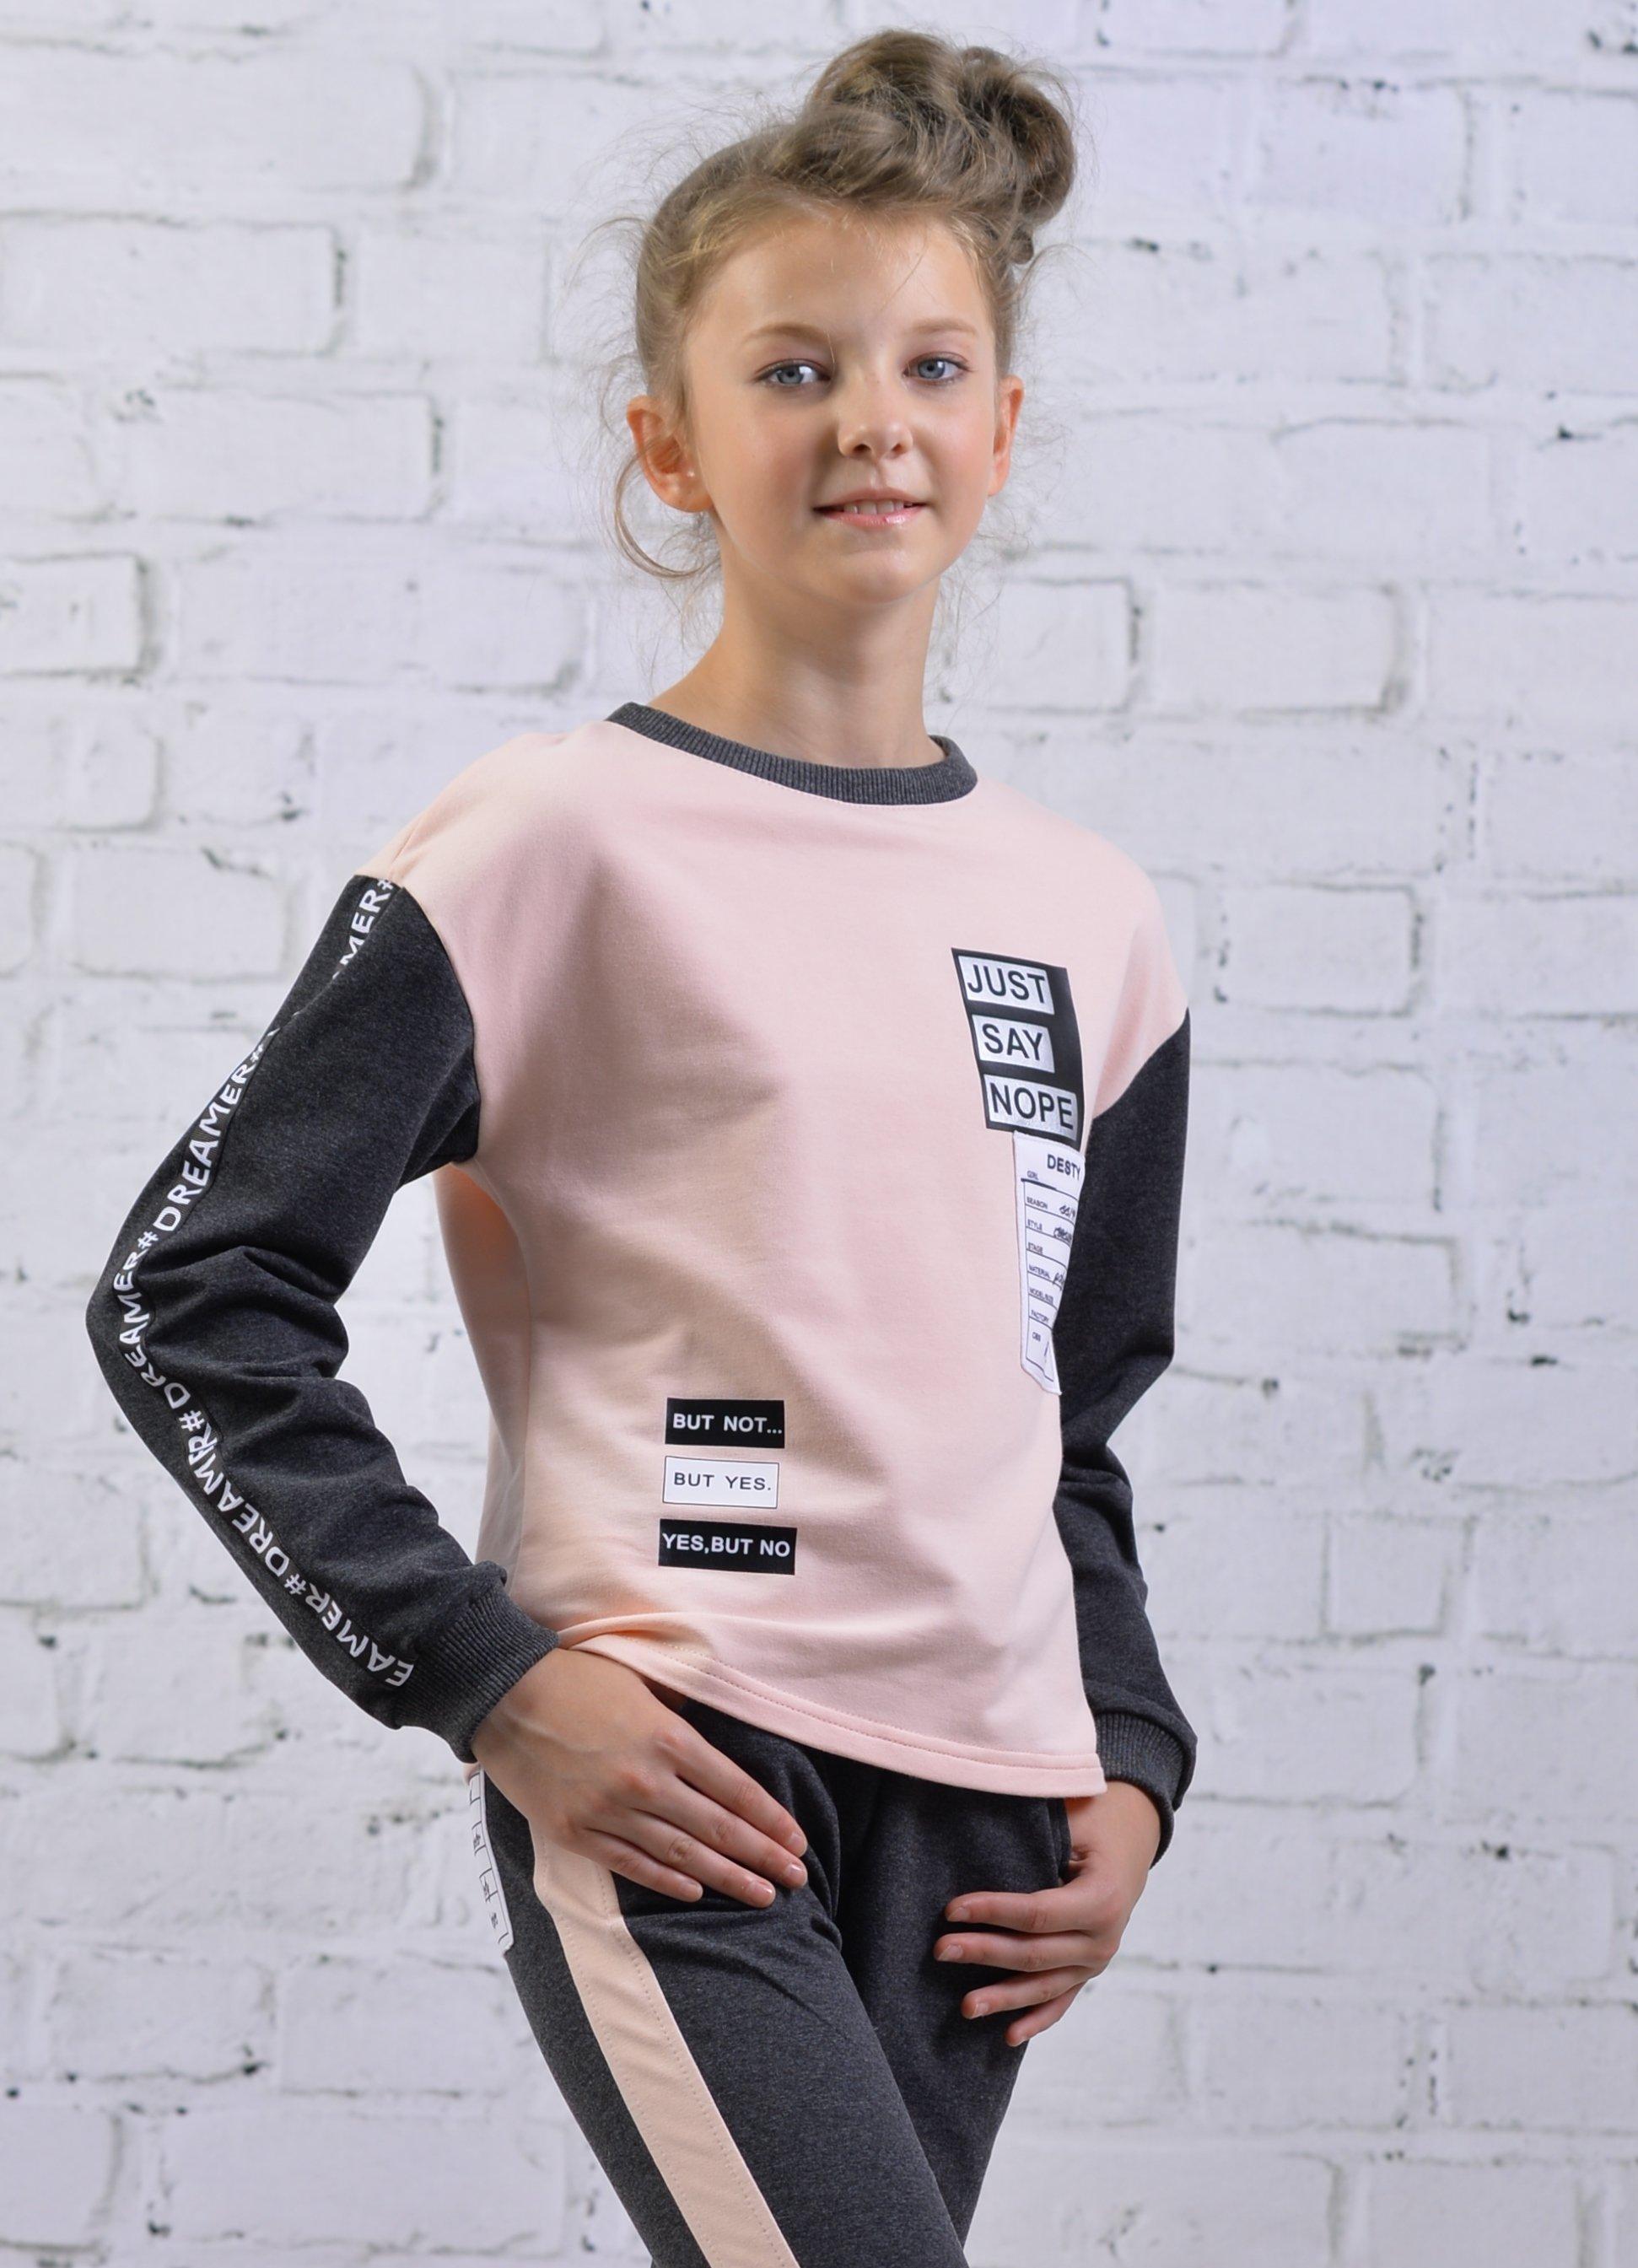 Джемпер для девочки DSDT135